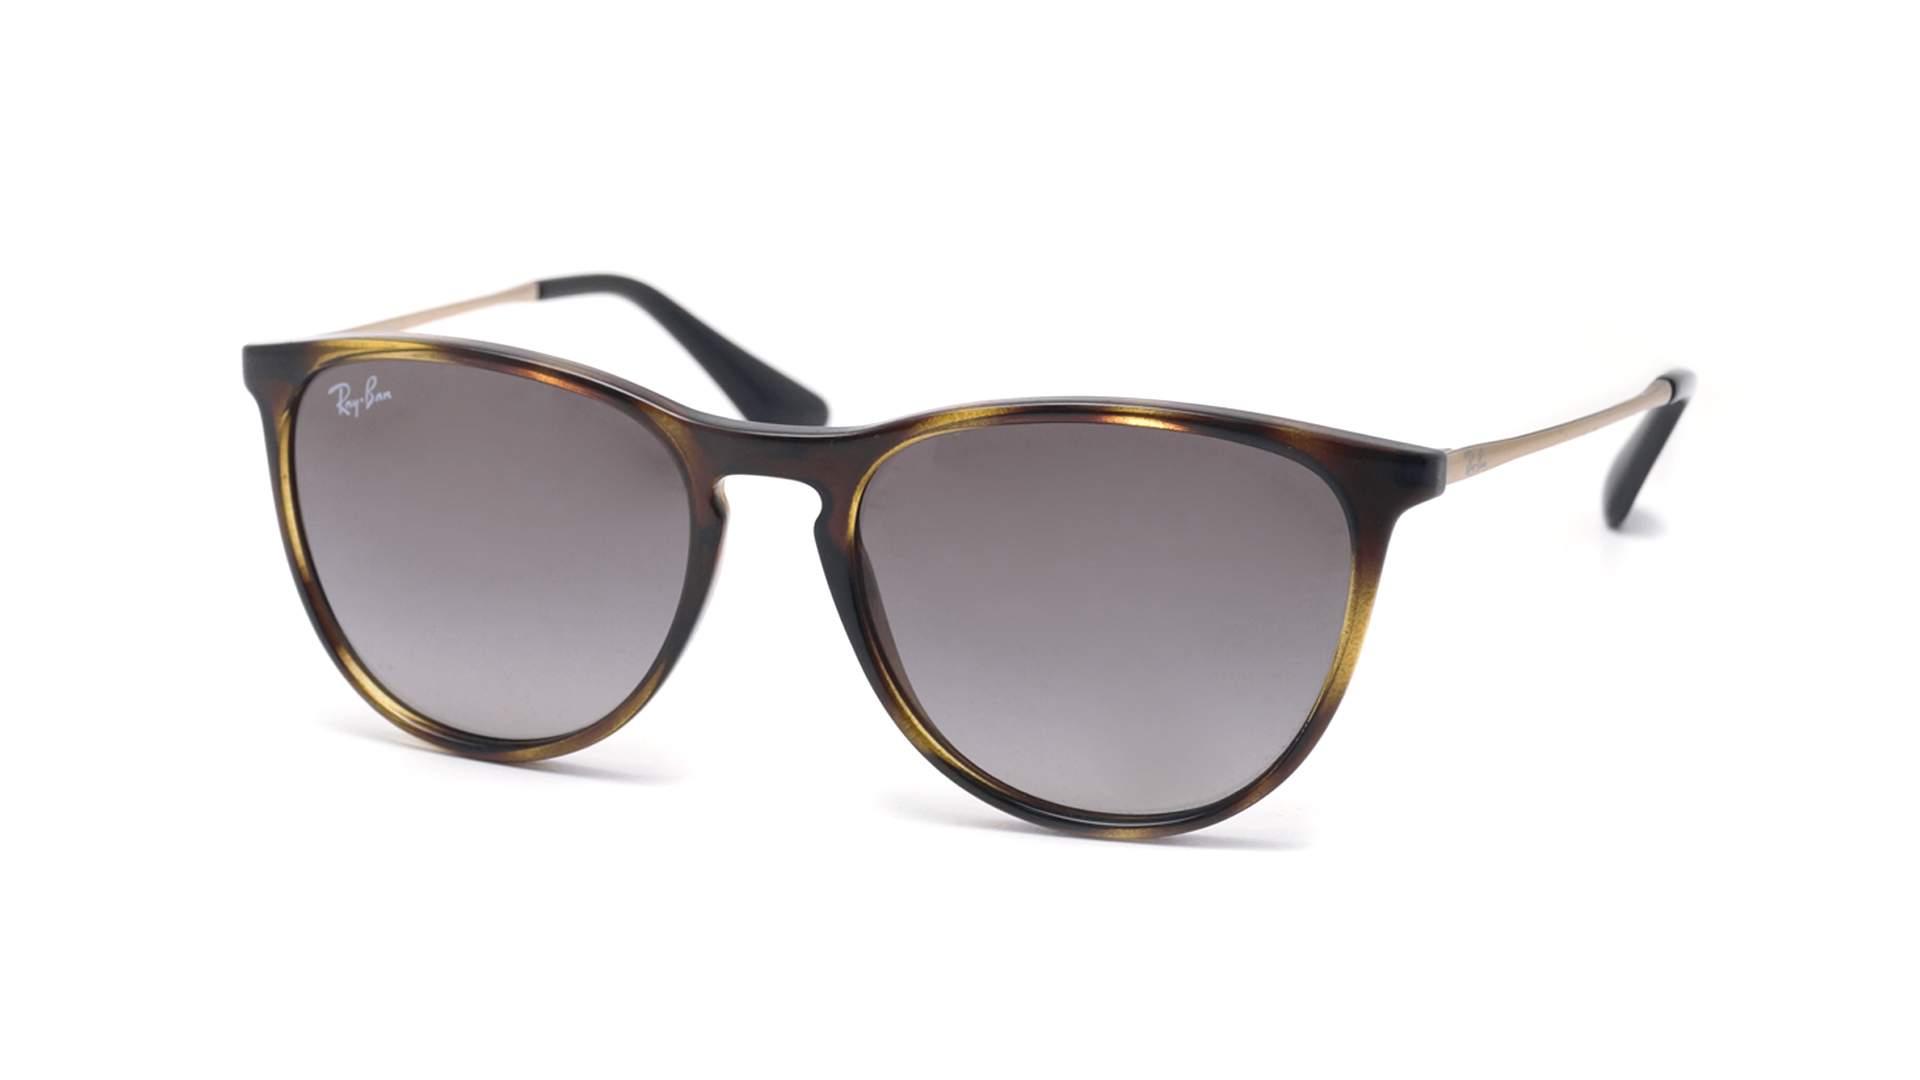 3ab4ac307e Sunglasses Ray-Ban Erika Tortoise RJ9060S 7049 11 50-15 Junior Gradient